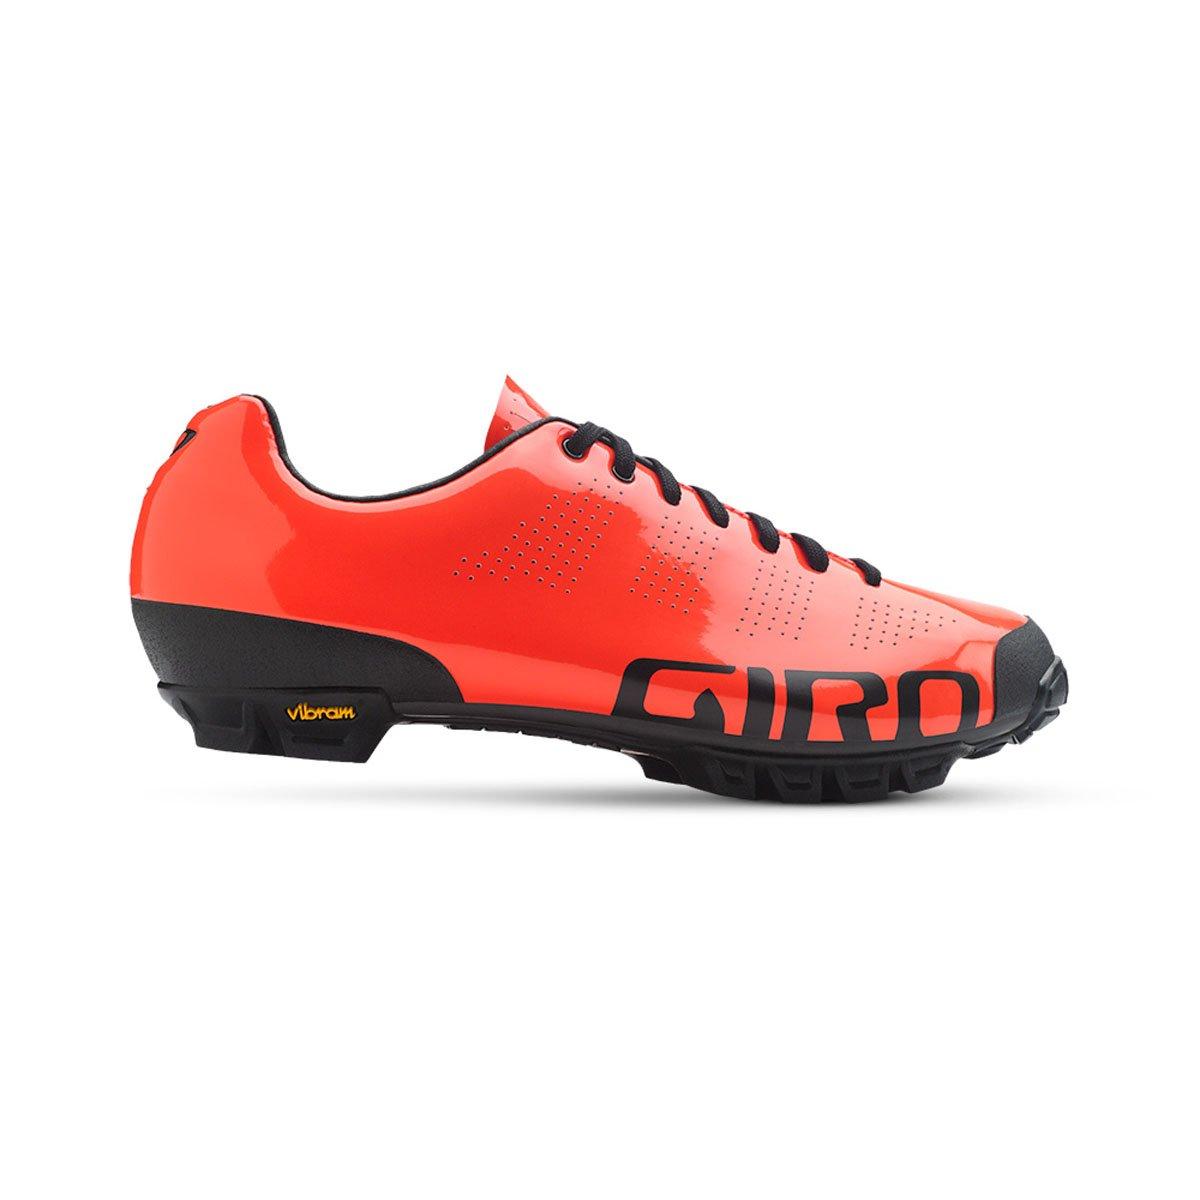 Giro Empire VR90 Shoes - Men's B01M0D2EGZ 46.5|Vermillion/Black